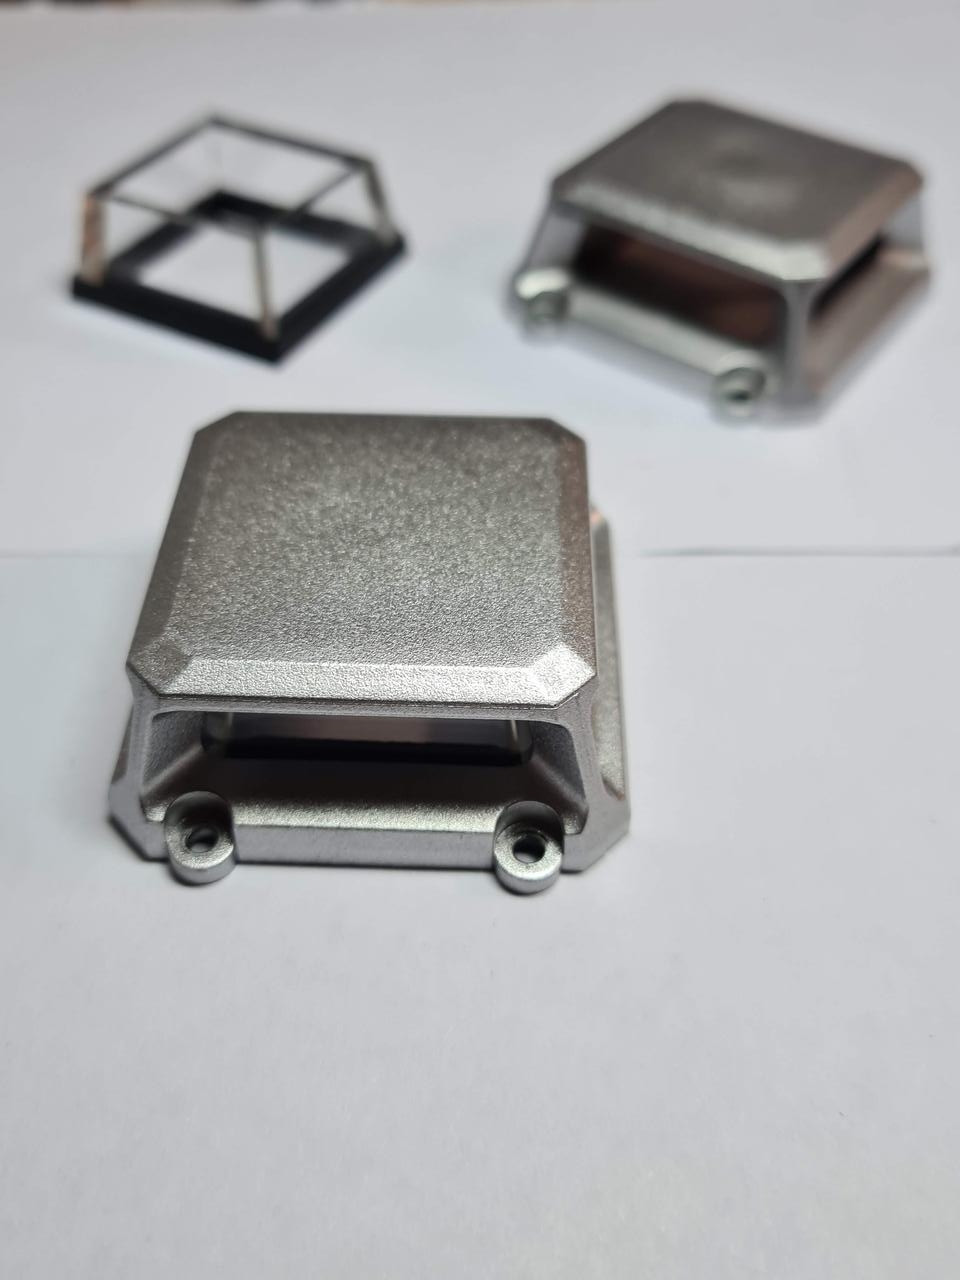 💥Башня/стекло/окно/ боковая для лазерного уровня Deko DKLL12 pb2